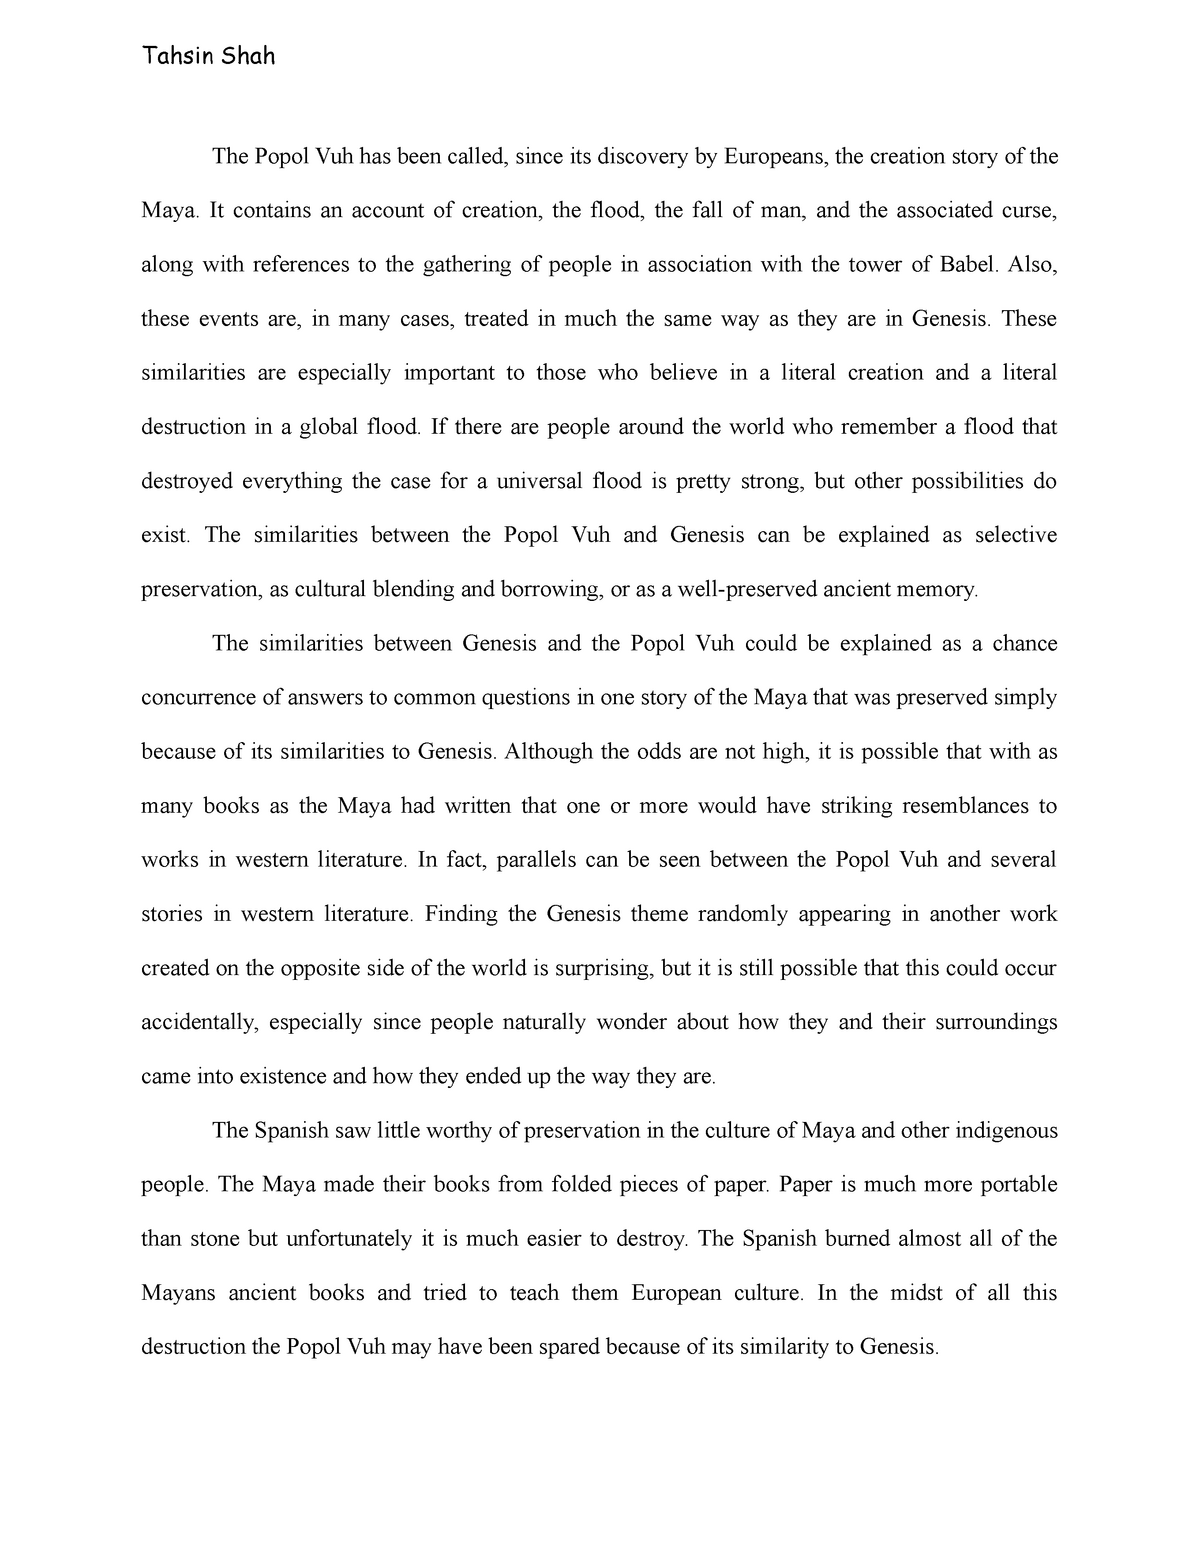 Popol Vuh Essay